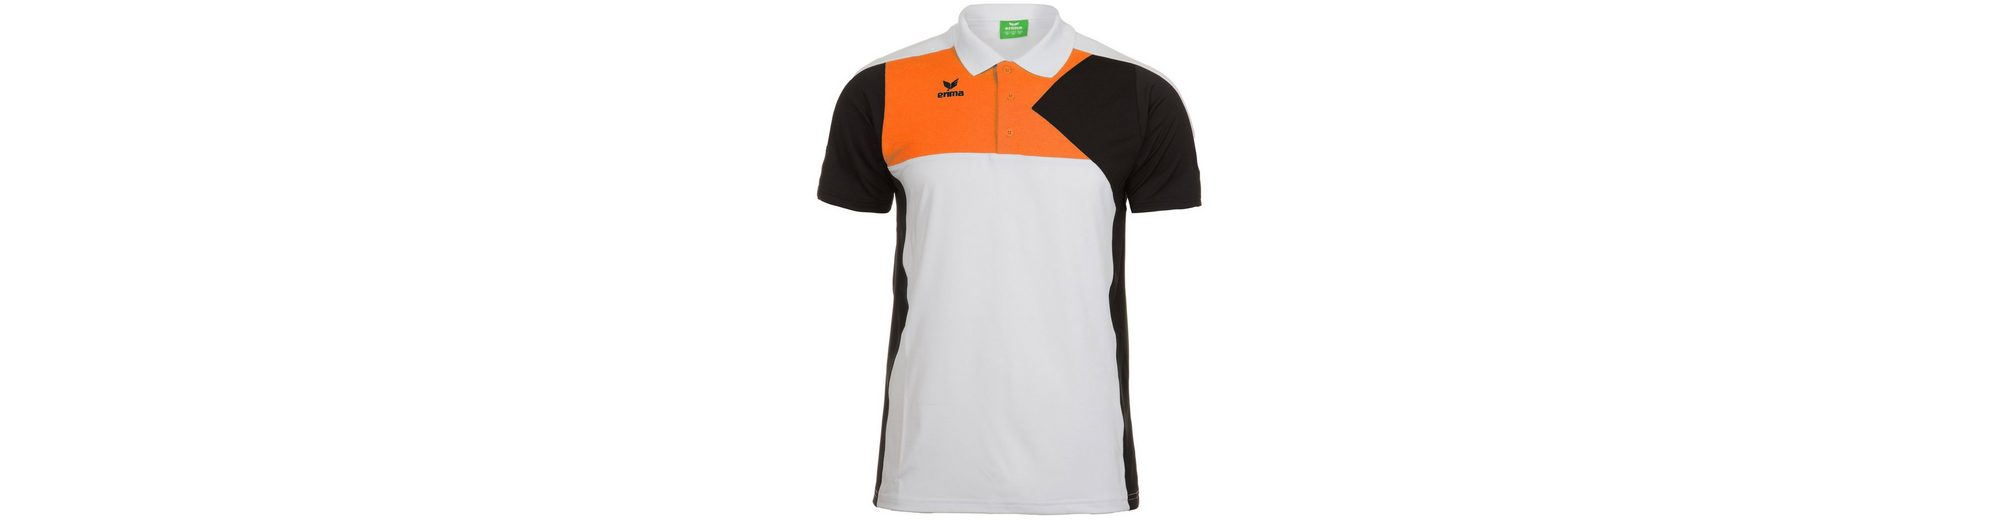 ERIMA Premium One Poloshirt Herren Original- Mode-Stil Online-Verkauf Rabatt Wahl XXnqKUCI